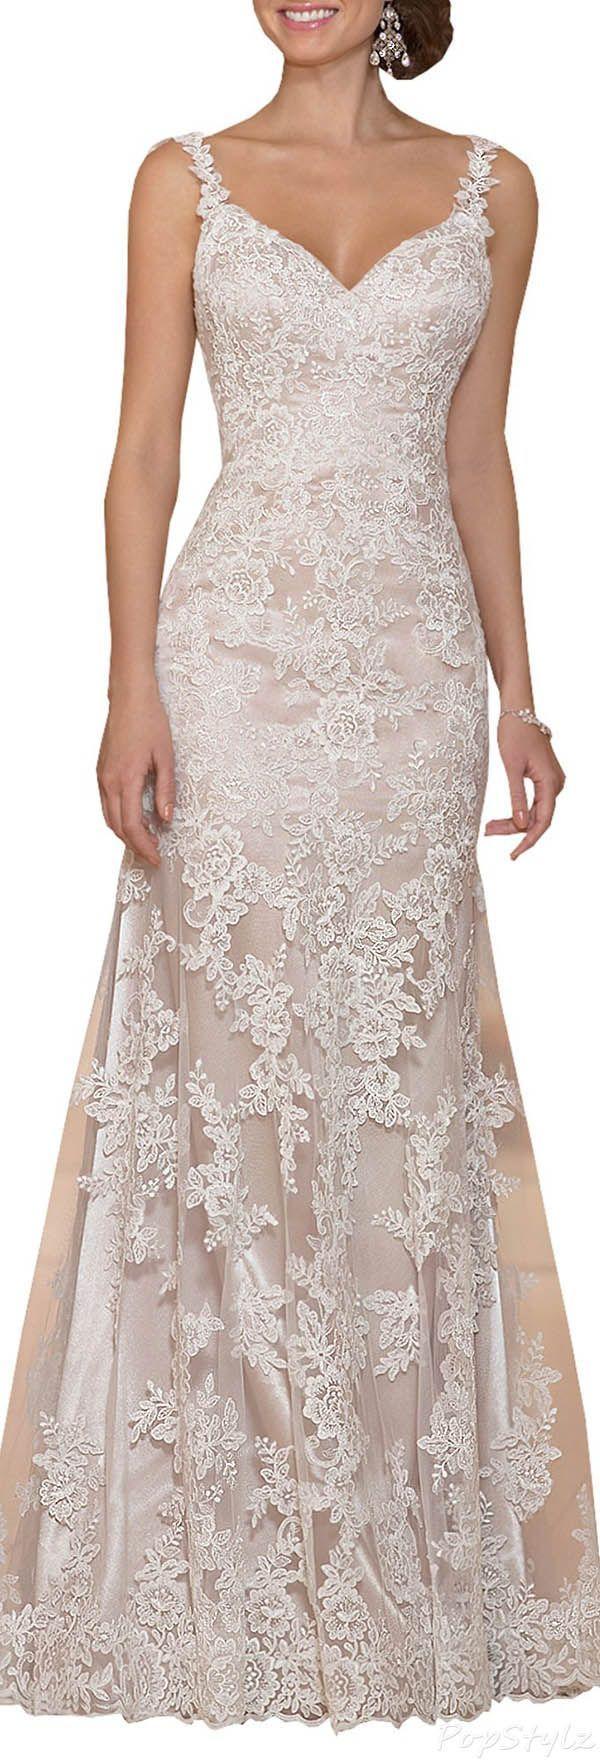 Best 25 Wedding dress straps ideas on Pinterest  Bodice wedding dress Wedding dresses and